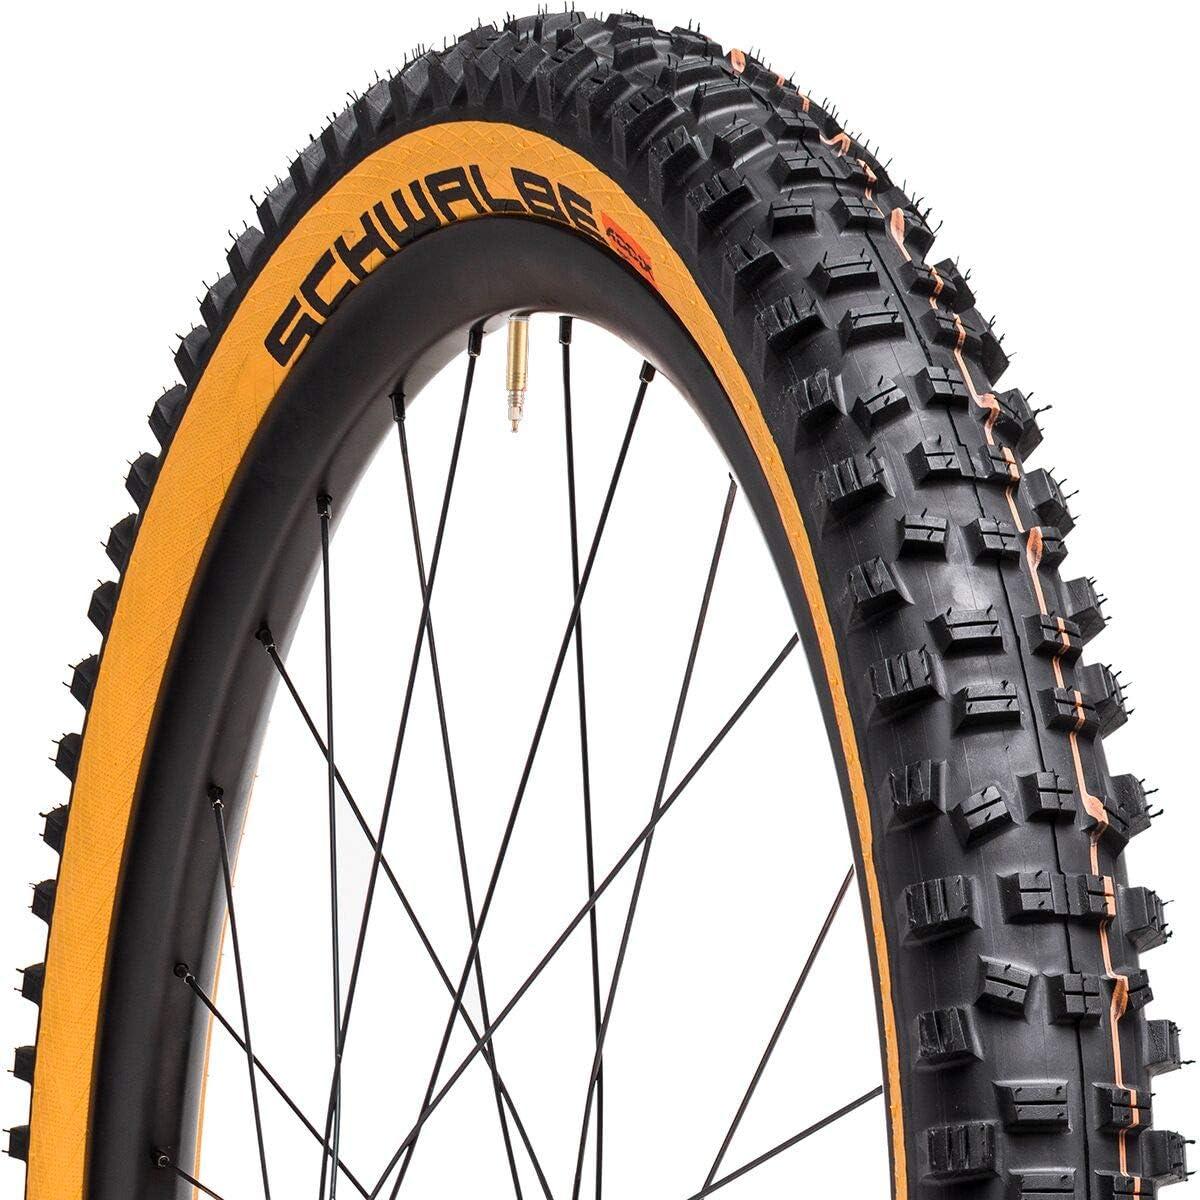 EvolutionLine Big Betty Downhill and Enduro Tubeless Folding Bike Tire 29 x 2.4 Black SCHWALBE Super Gravity Addix Soft